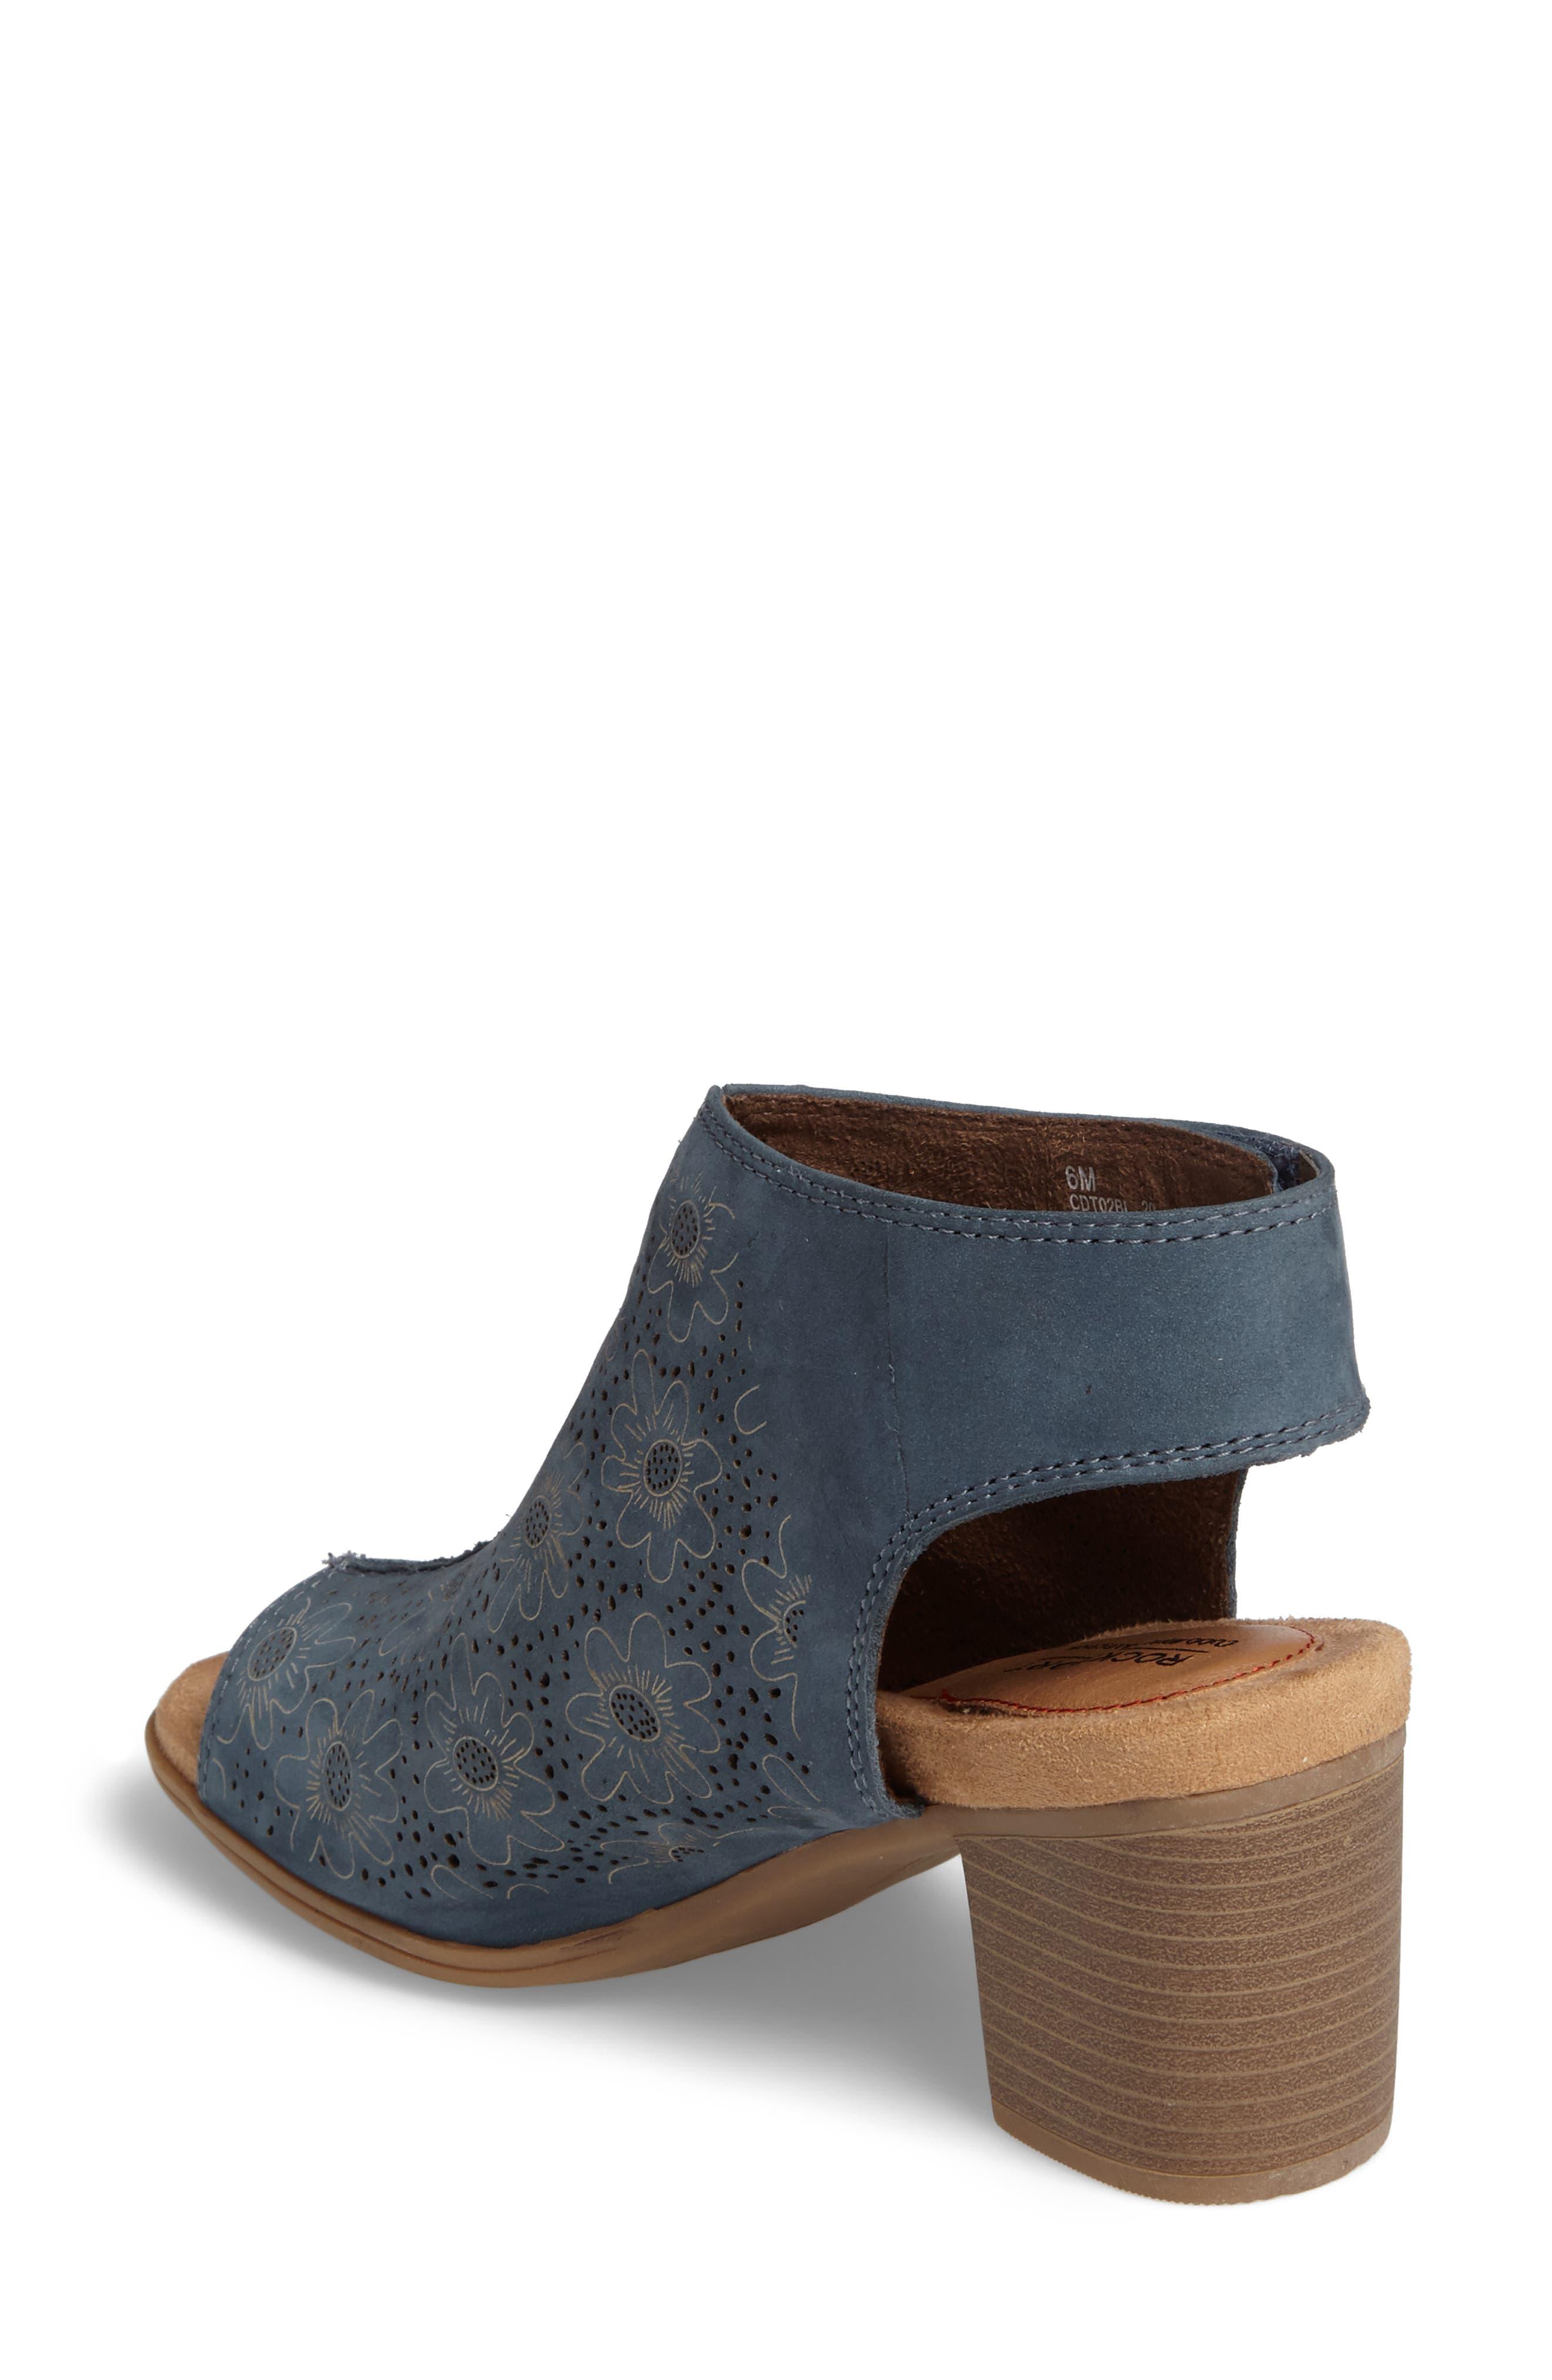 Alternate Image 2  - Rockport Cobb Hill Hattie Perforated Slingback Sandal (Women)